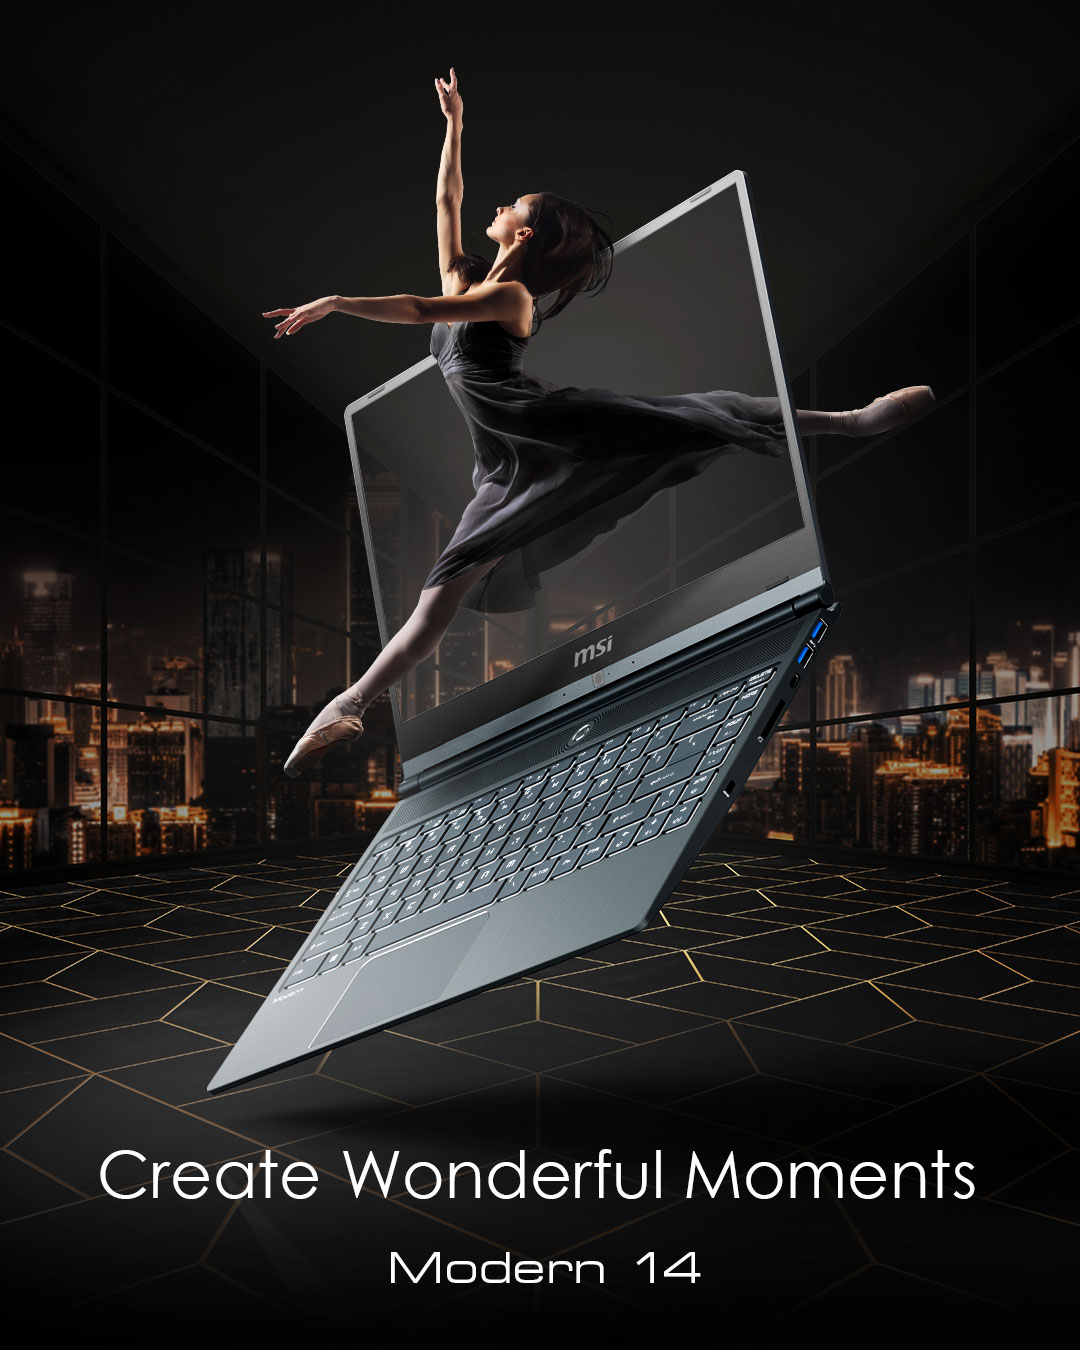 Modern 14 - Creat Wonderful Moments